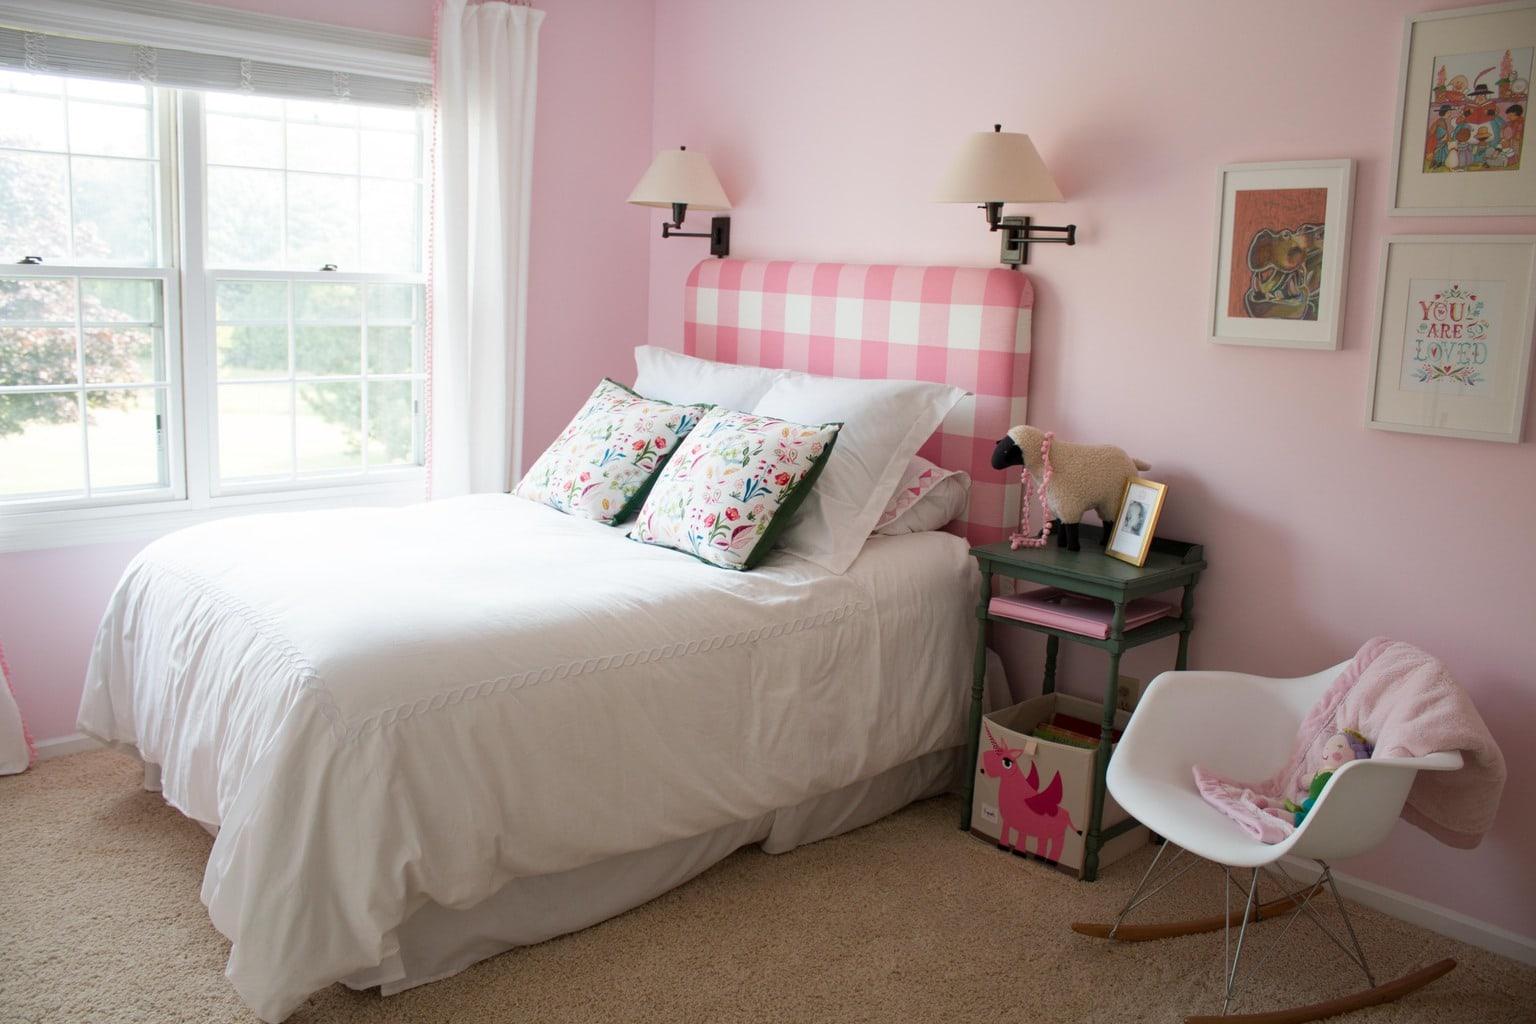 Diy Upholstered Headboard Home Decor Diy Decor Mom